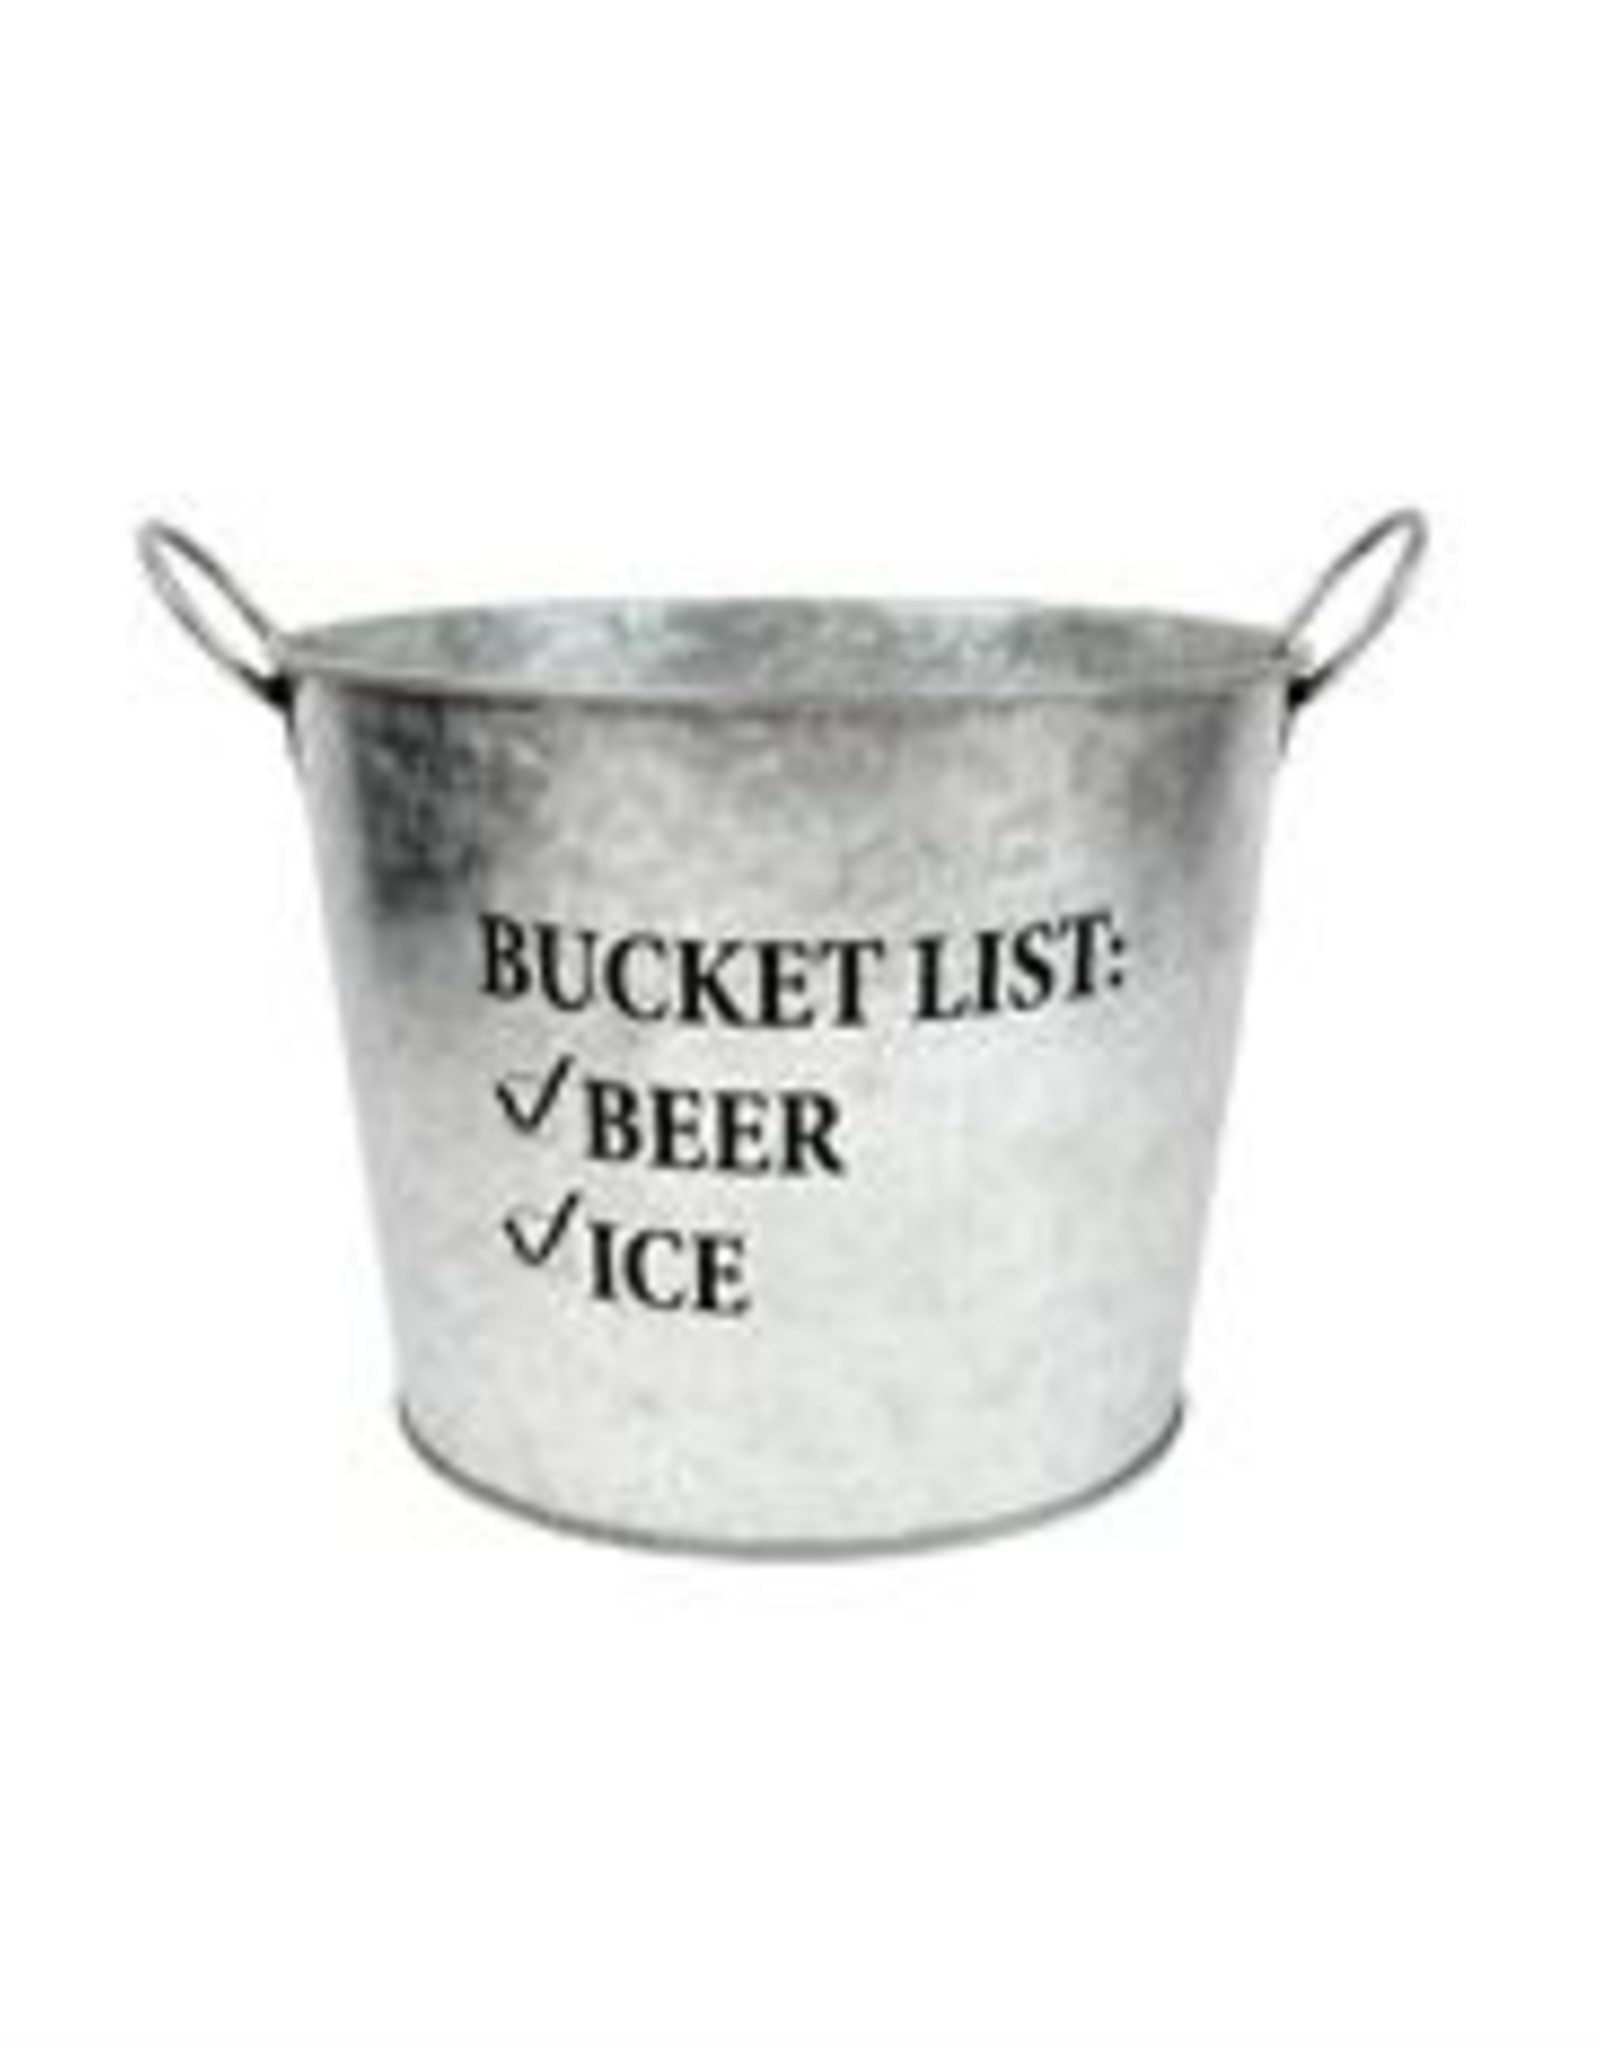 DEI Galvenized Beer Bucket